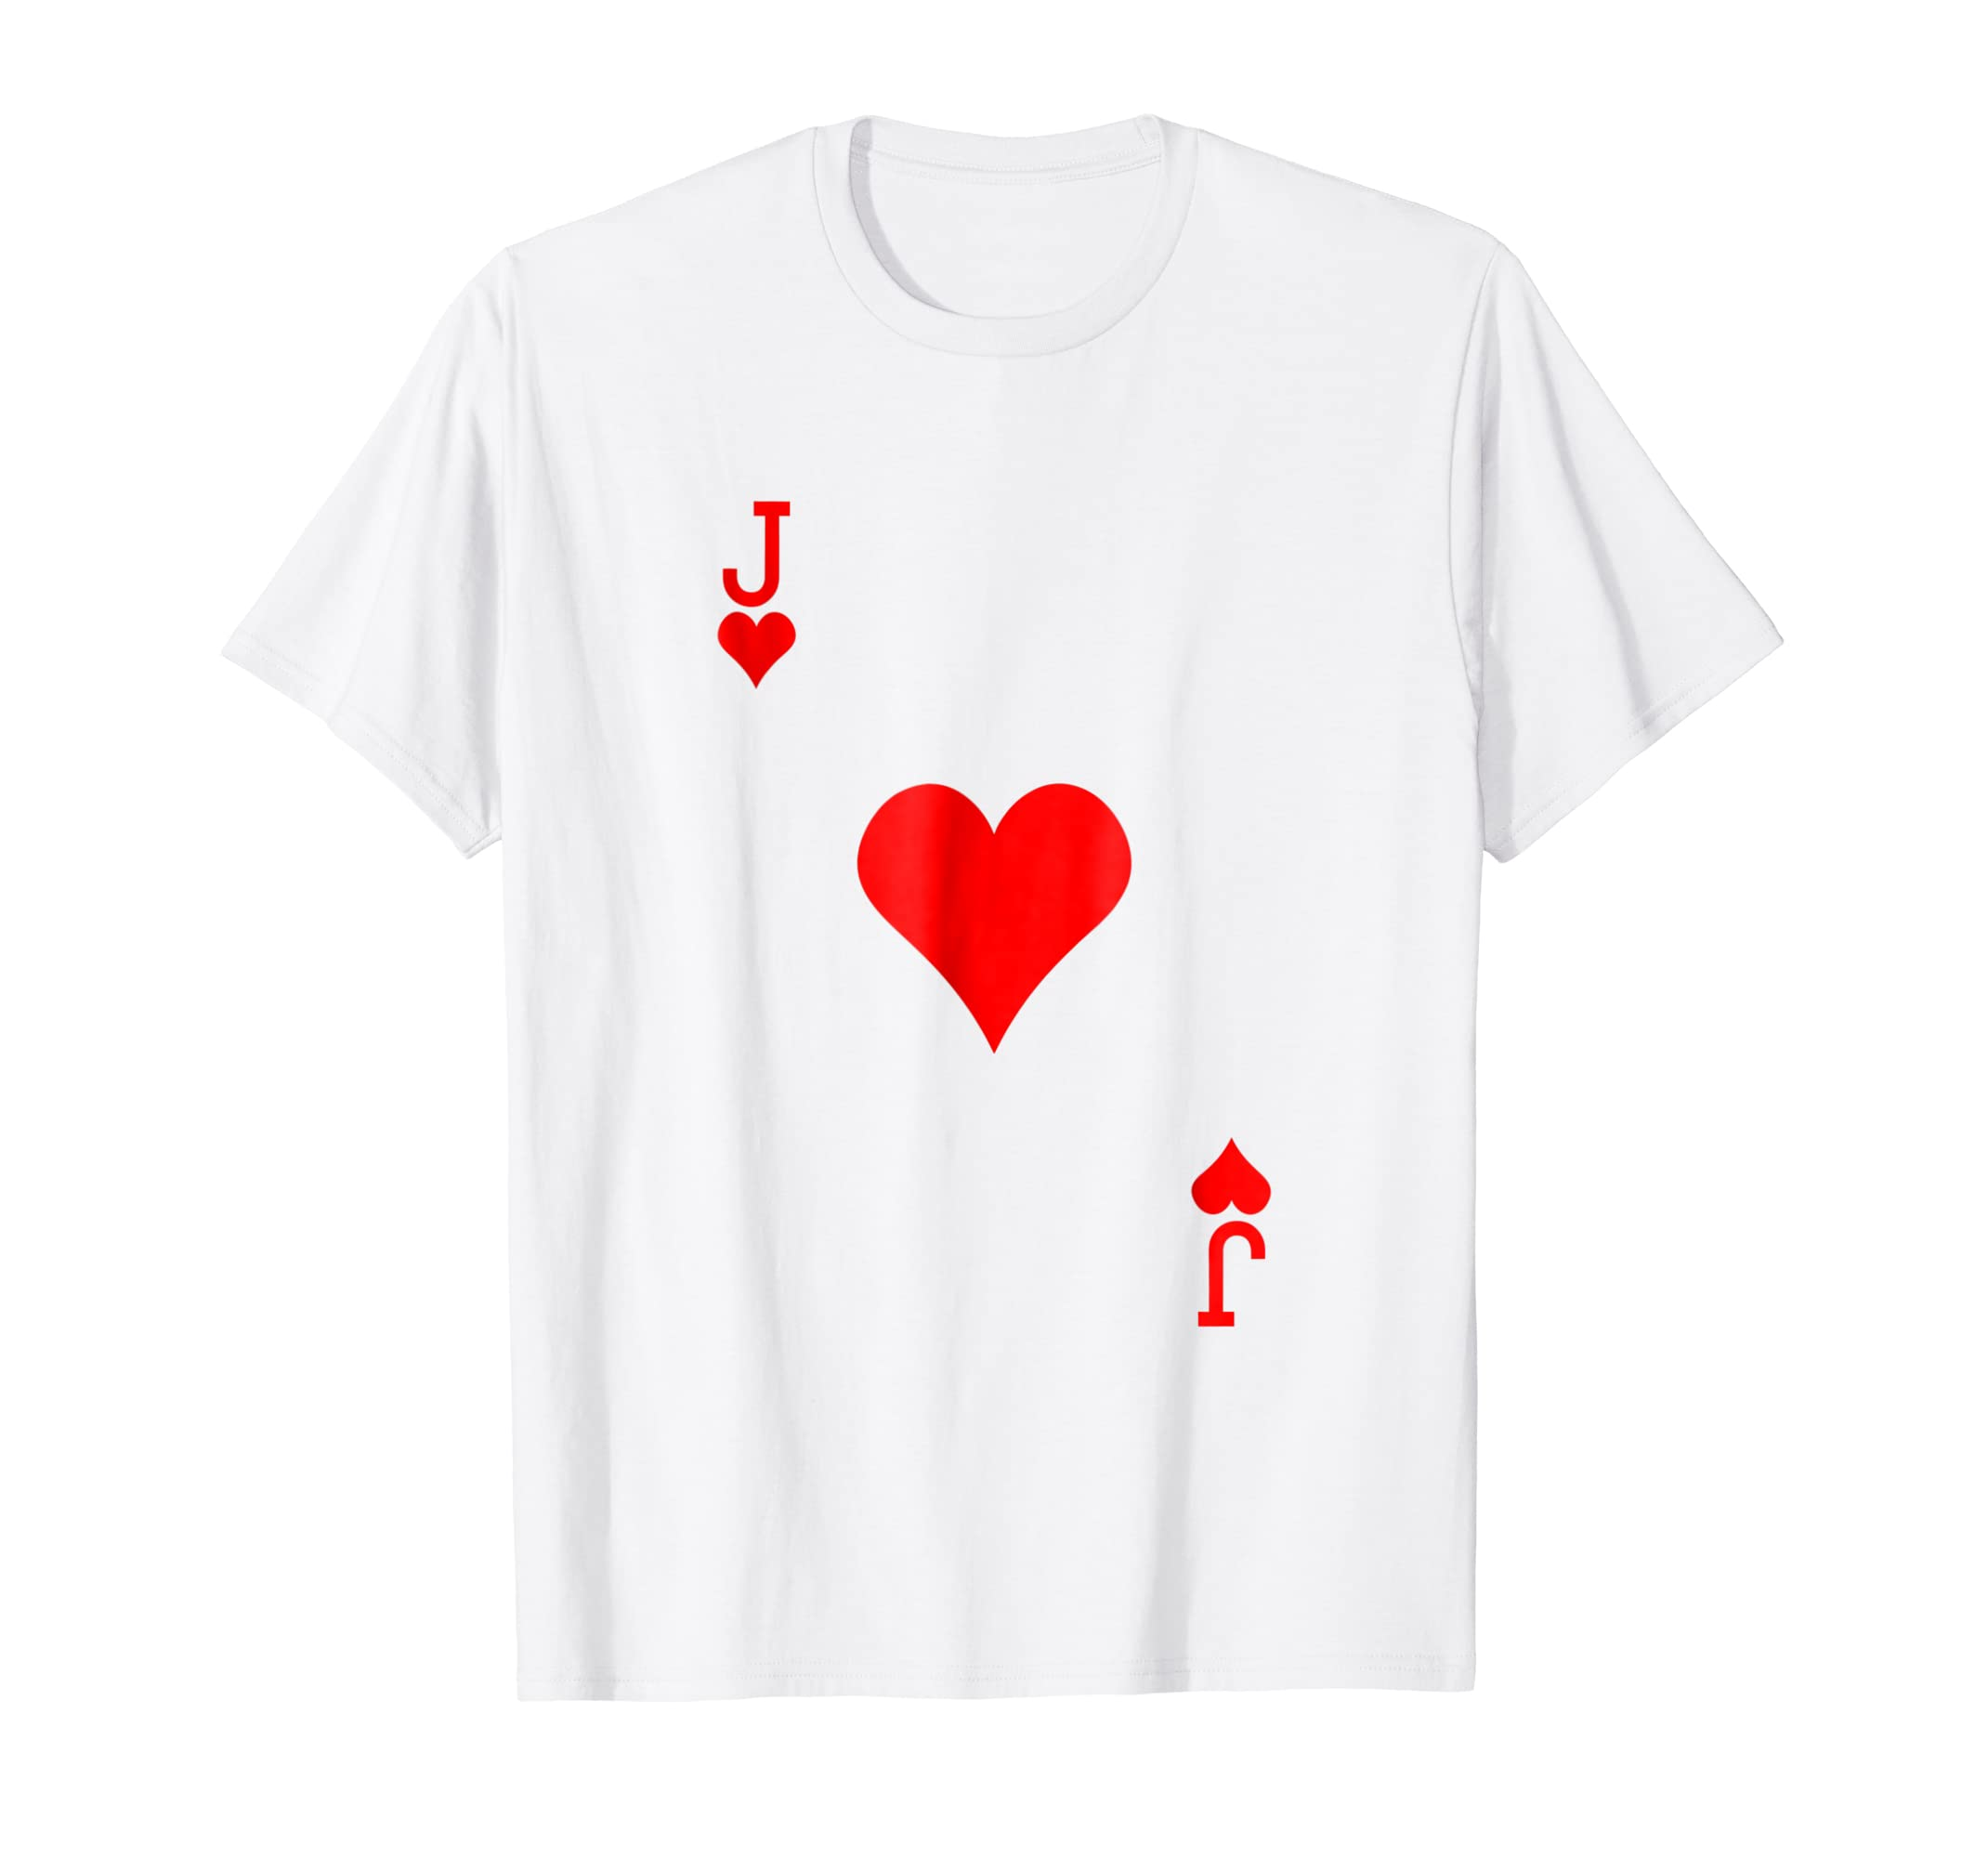 Jack of Hearts Costume Tshirt Halloween Deck of Cards-Teechatpro